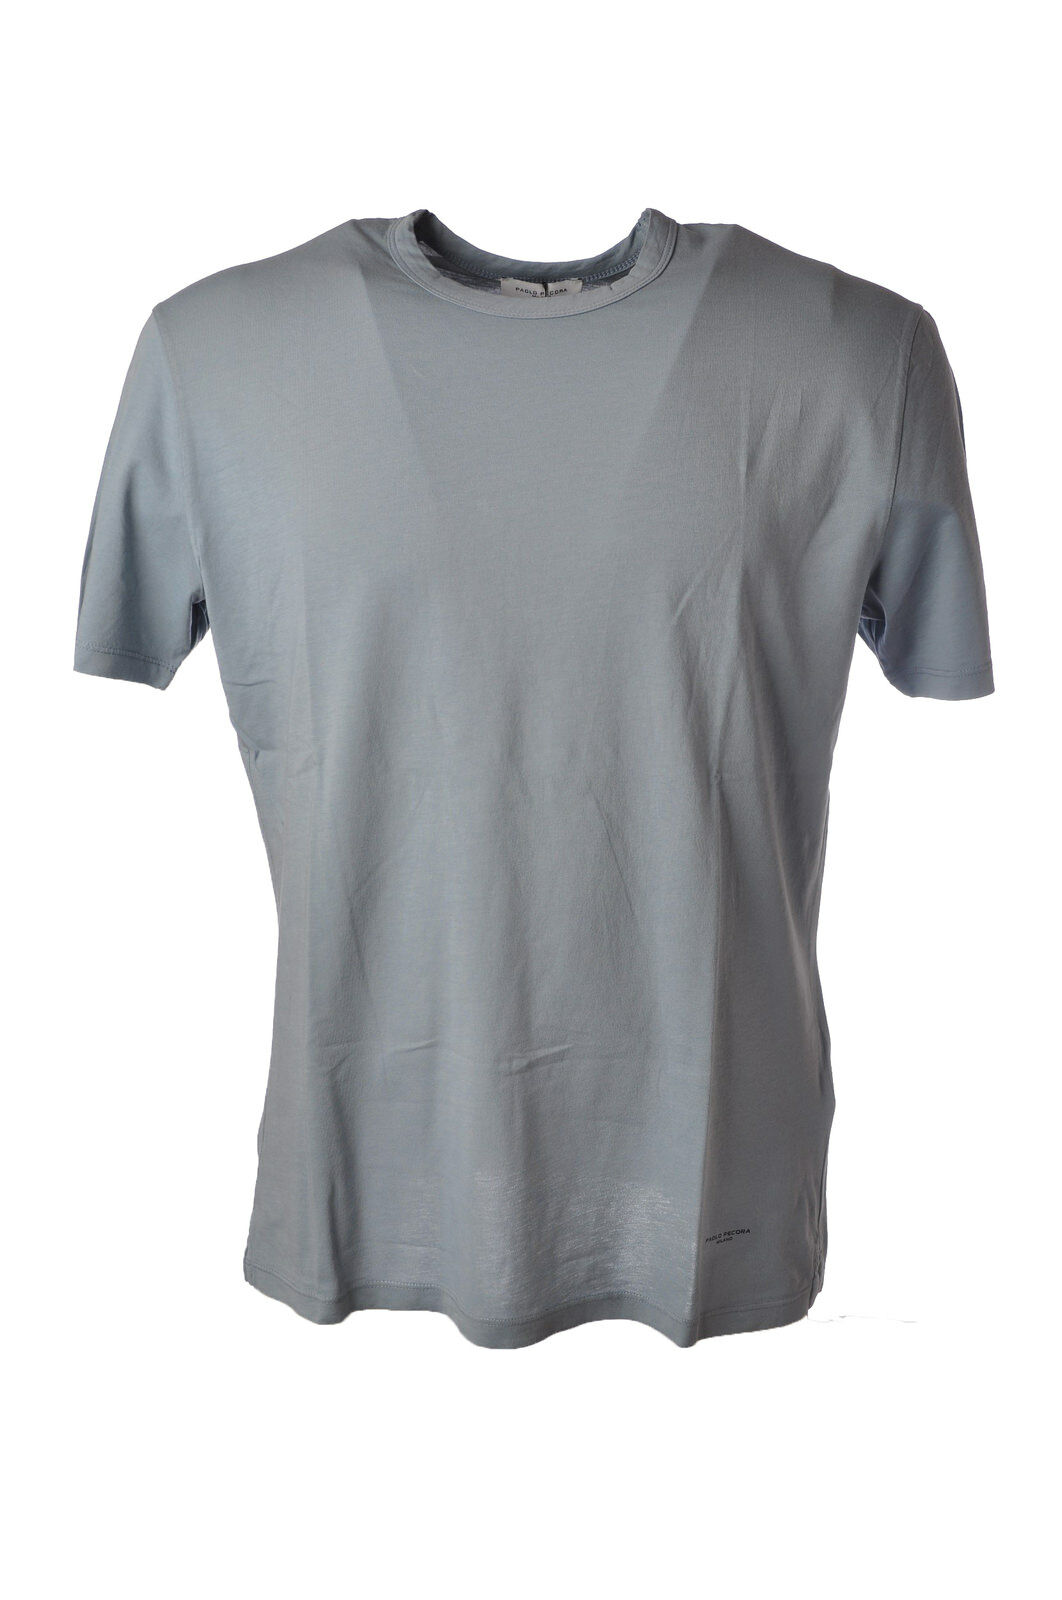 Paolo Pecora - Topwear-T-shirts - Man - Grau - 5039925I185141